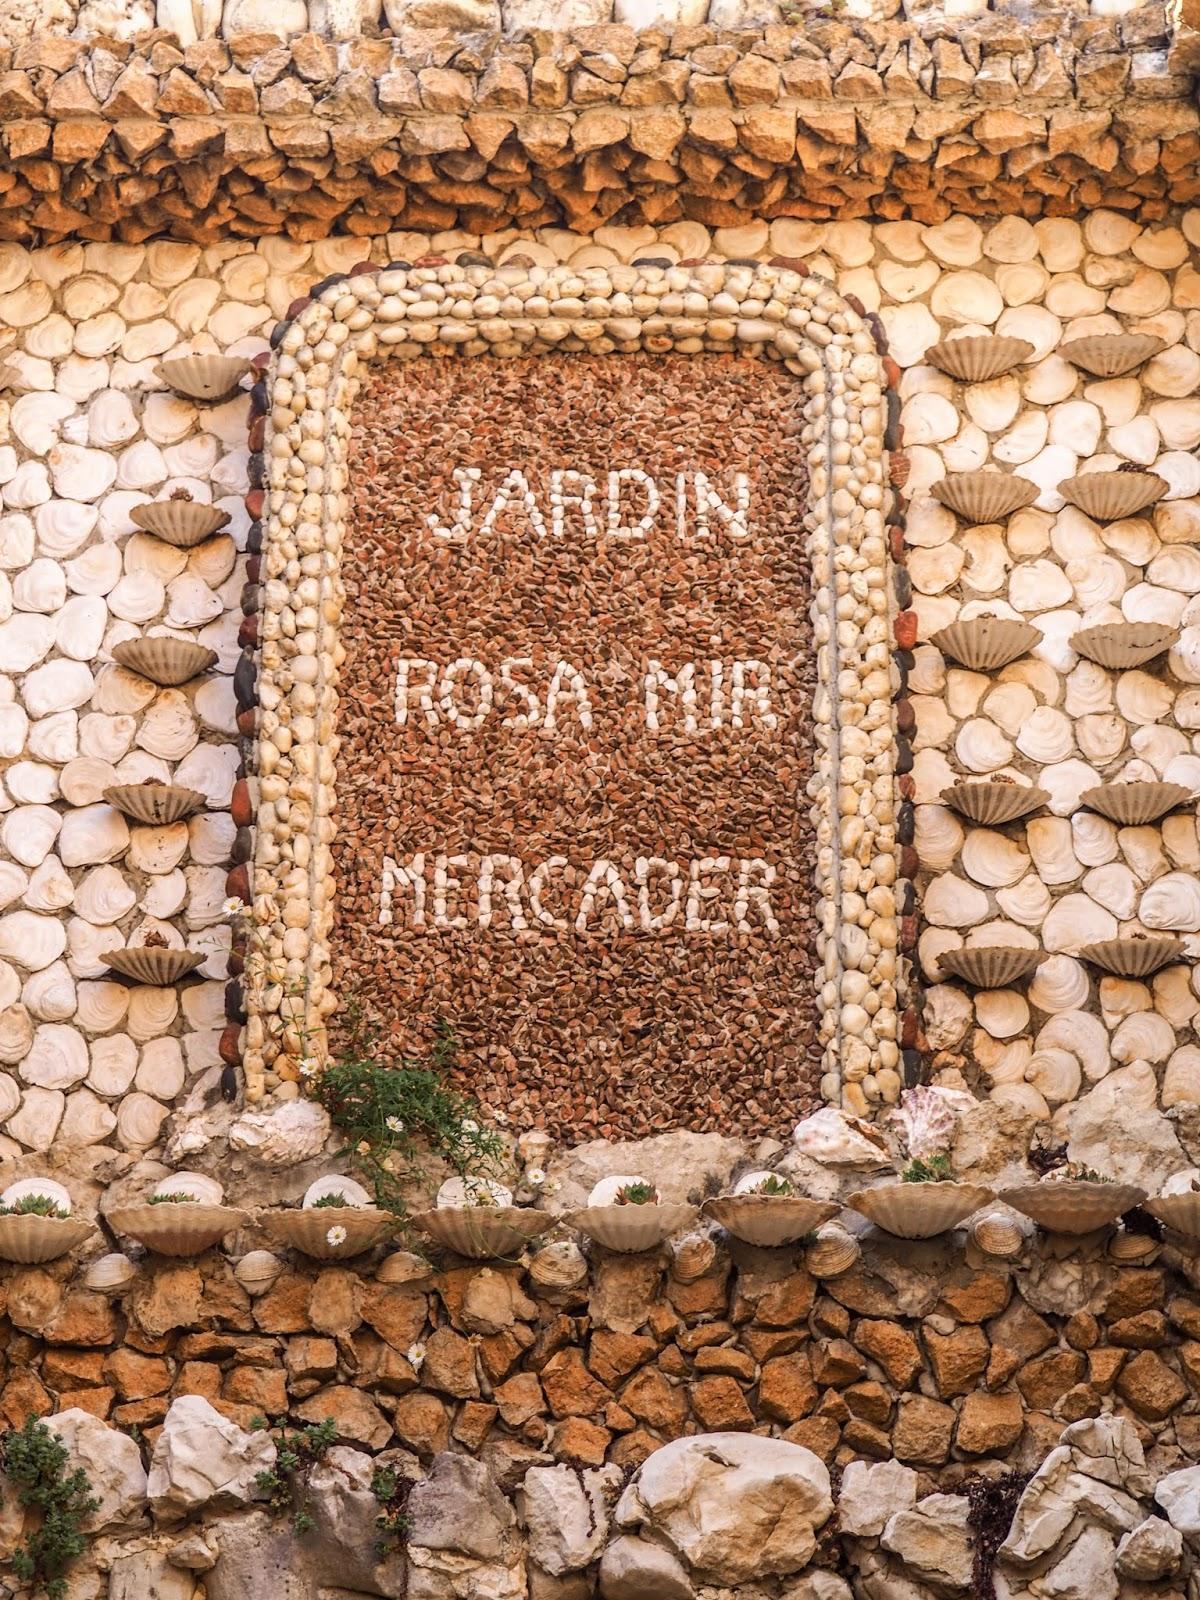 Lyon Le Joli Jardin Rosa Mir A La Croix Rousse Mes Petits